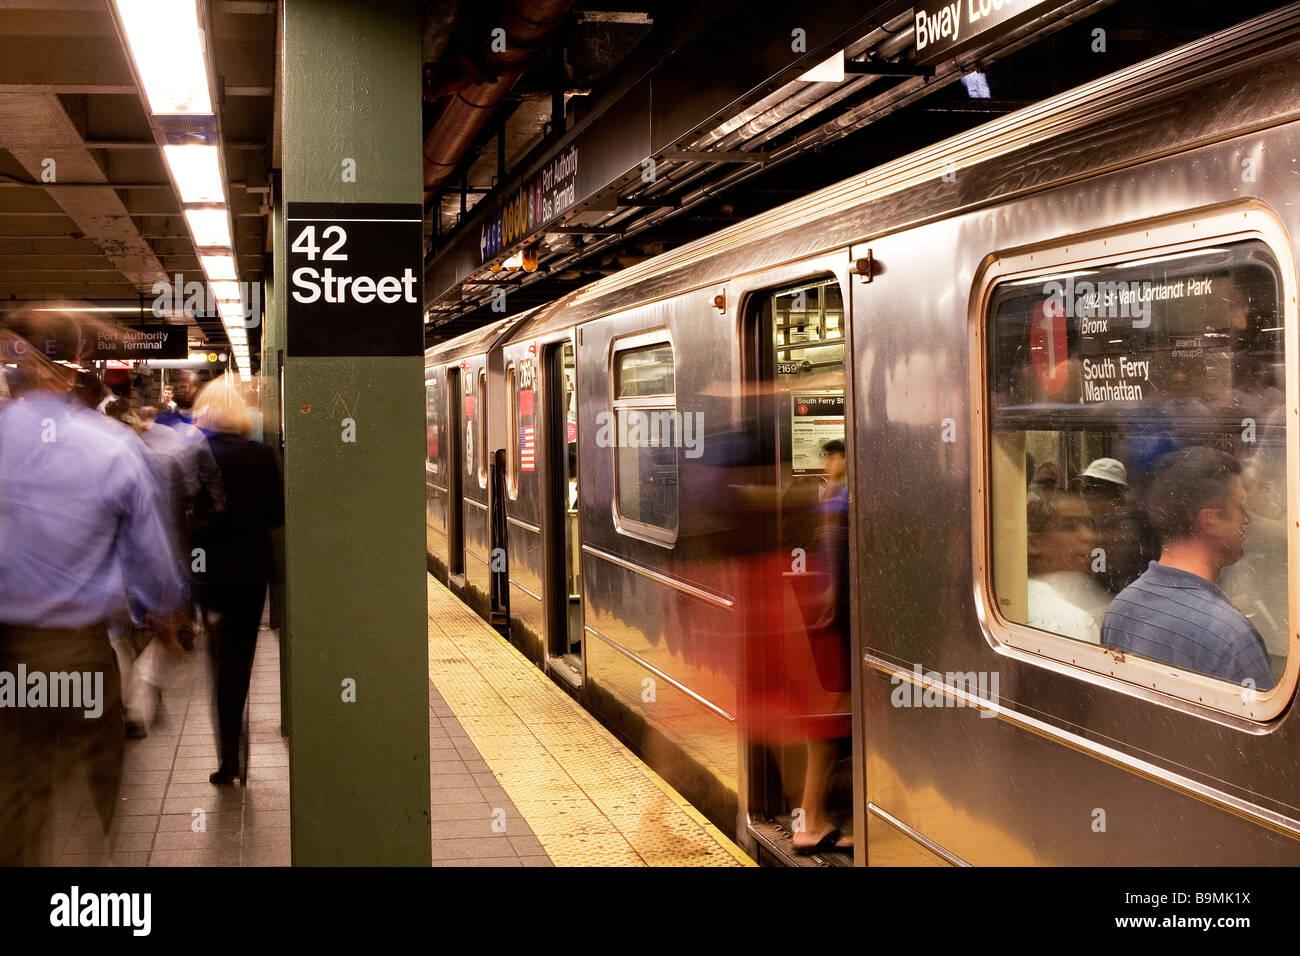 United States, New York City, Manhattan, subway on the 42nd street - Stock Image